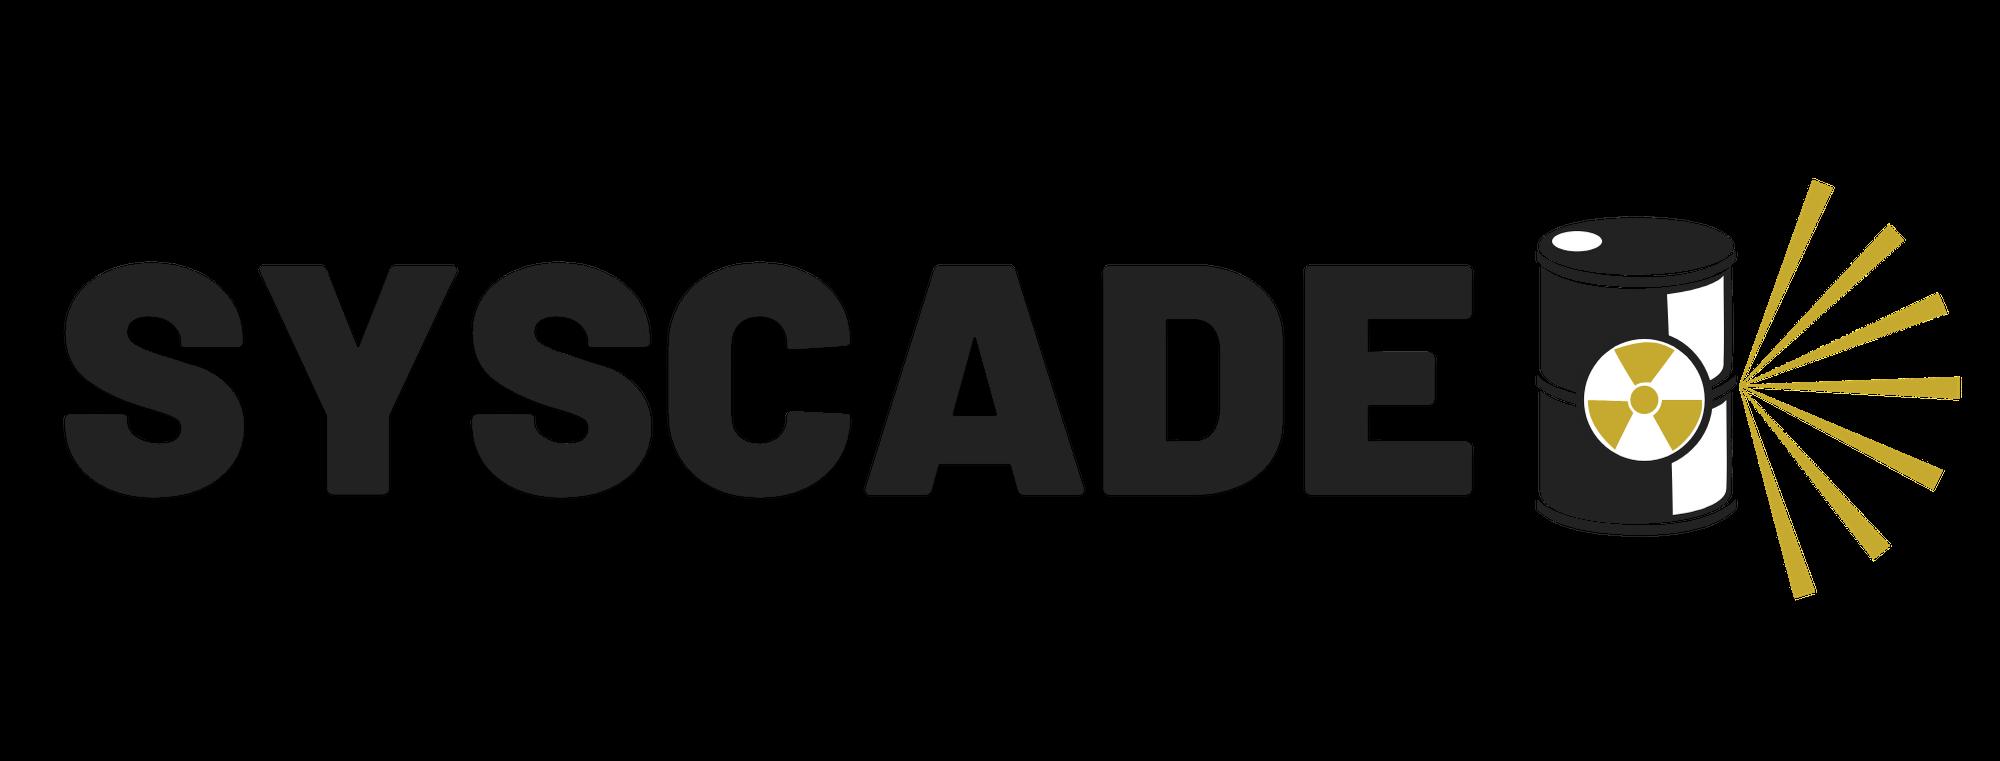 SYSCADE Mobile radiography